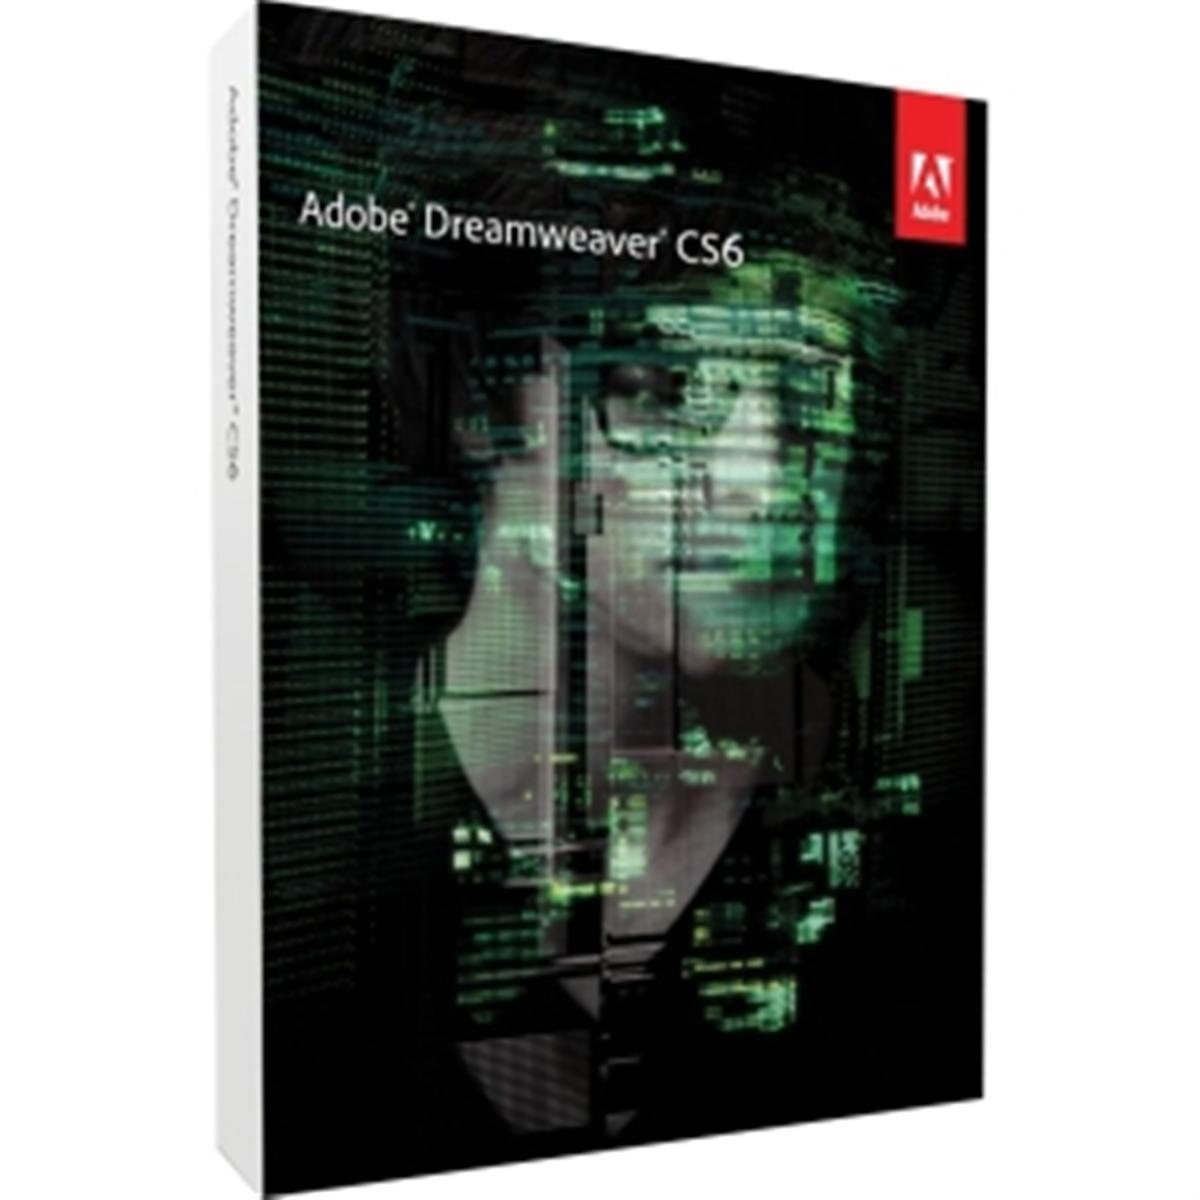 adobe dreamweaver cs6 single link